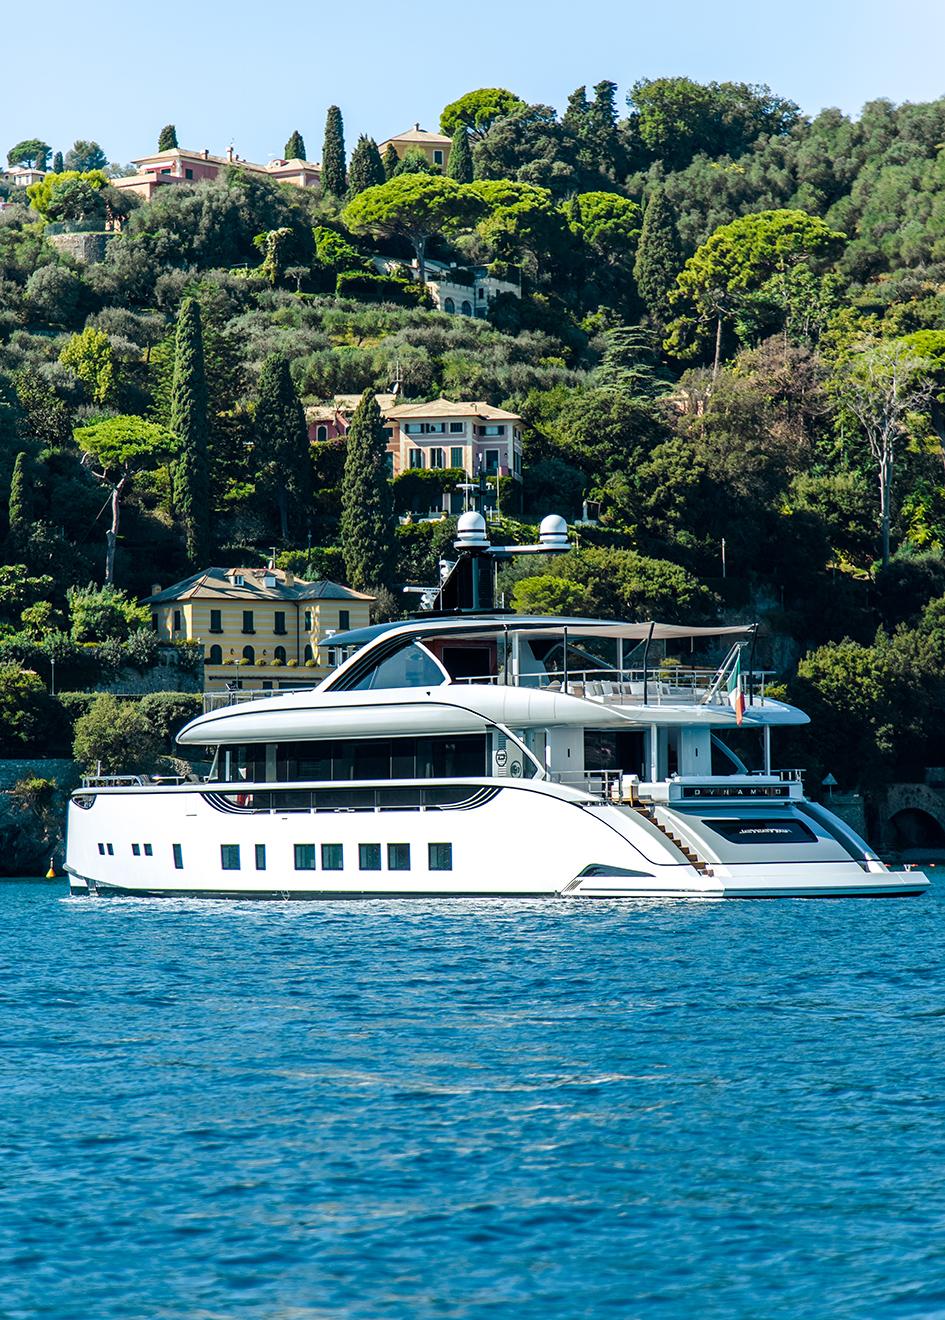 portside-view-of-dynamiq-super-yacht-jetsetter